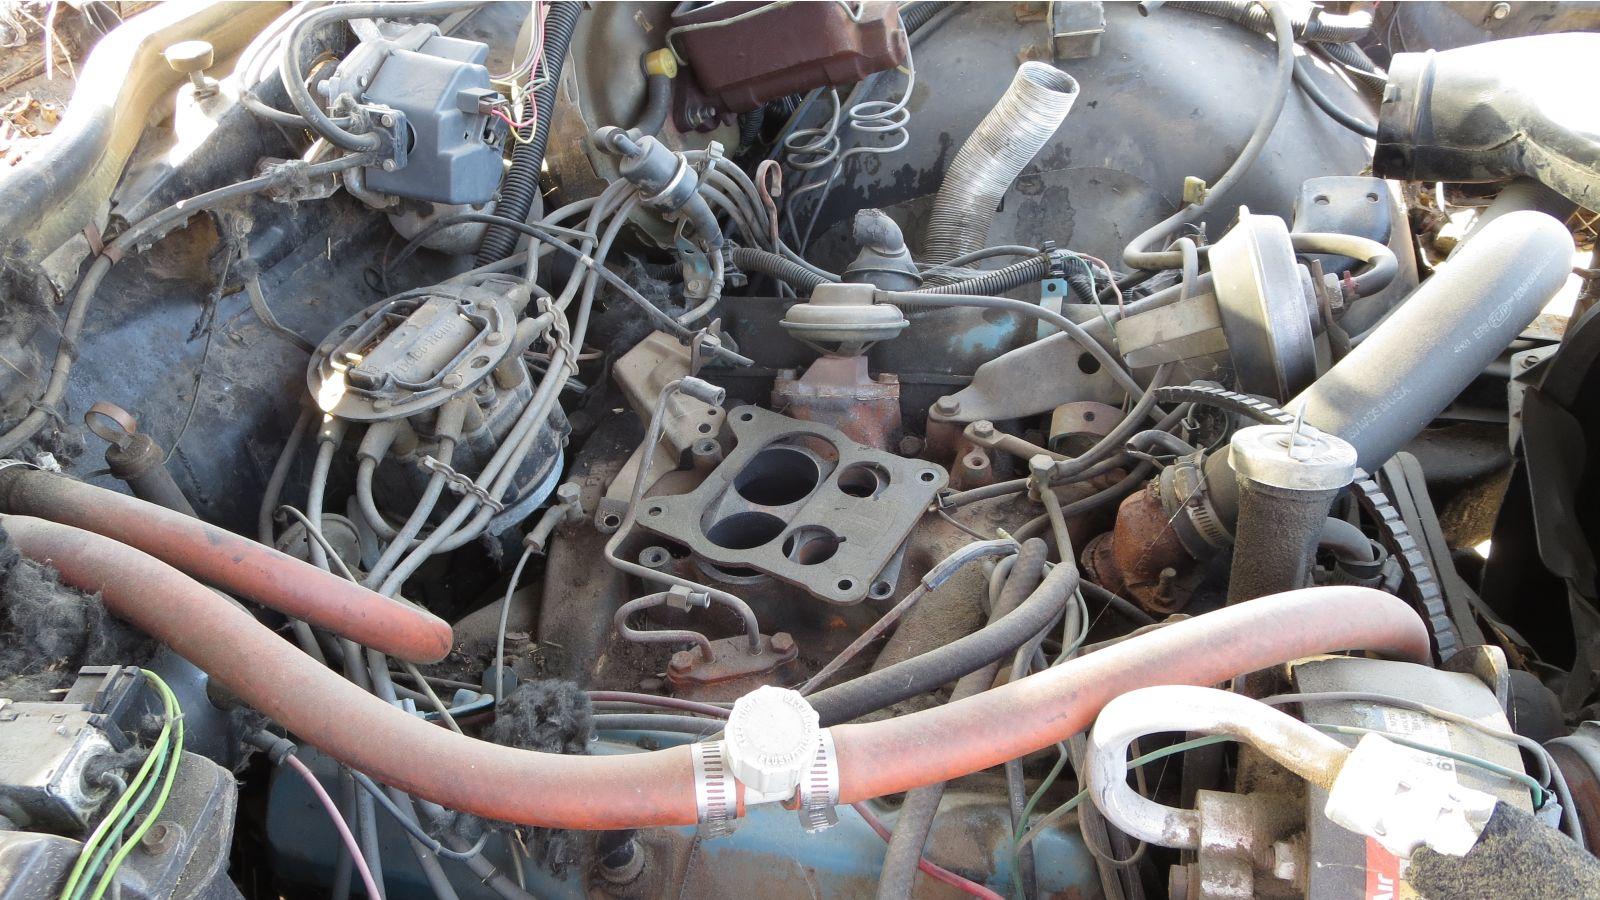 1979 Buick LeSabre Oldsmobile 350 engine